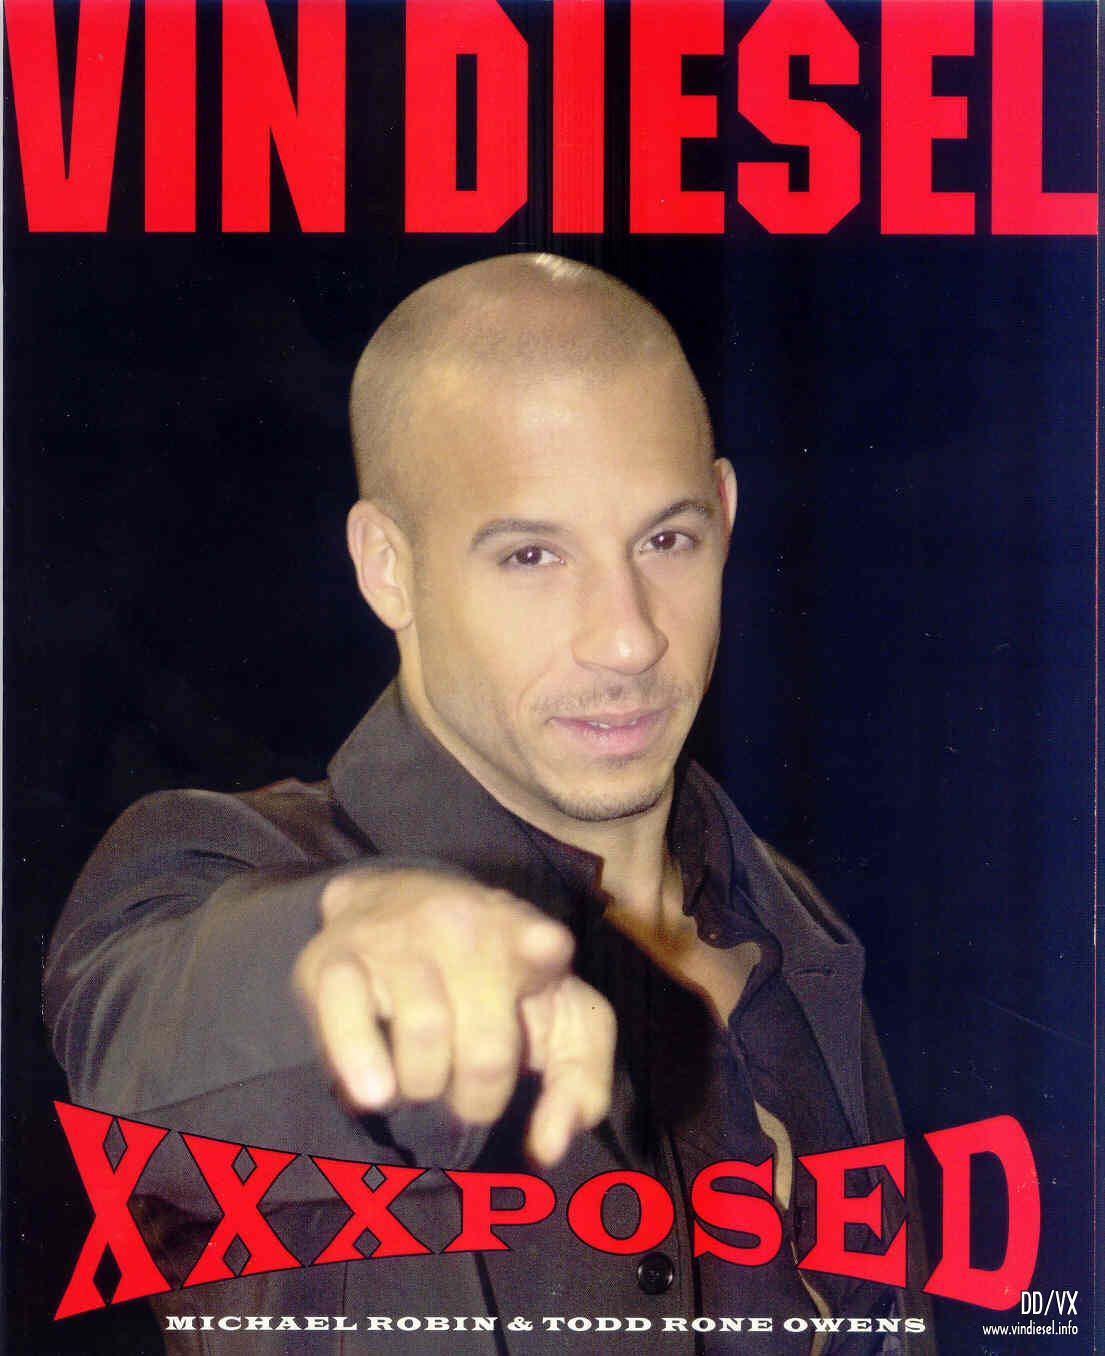 xxxposed-2002-cover.jpg